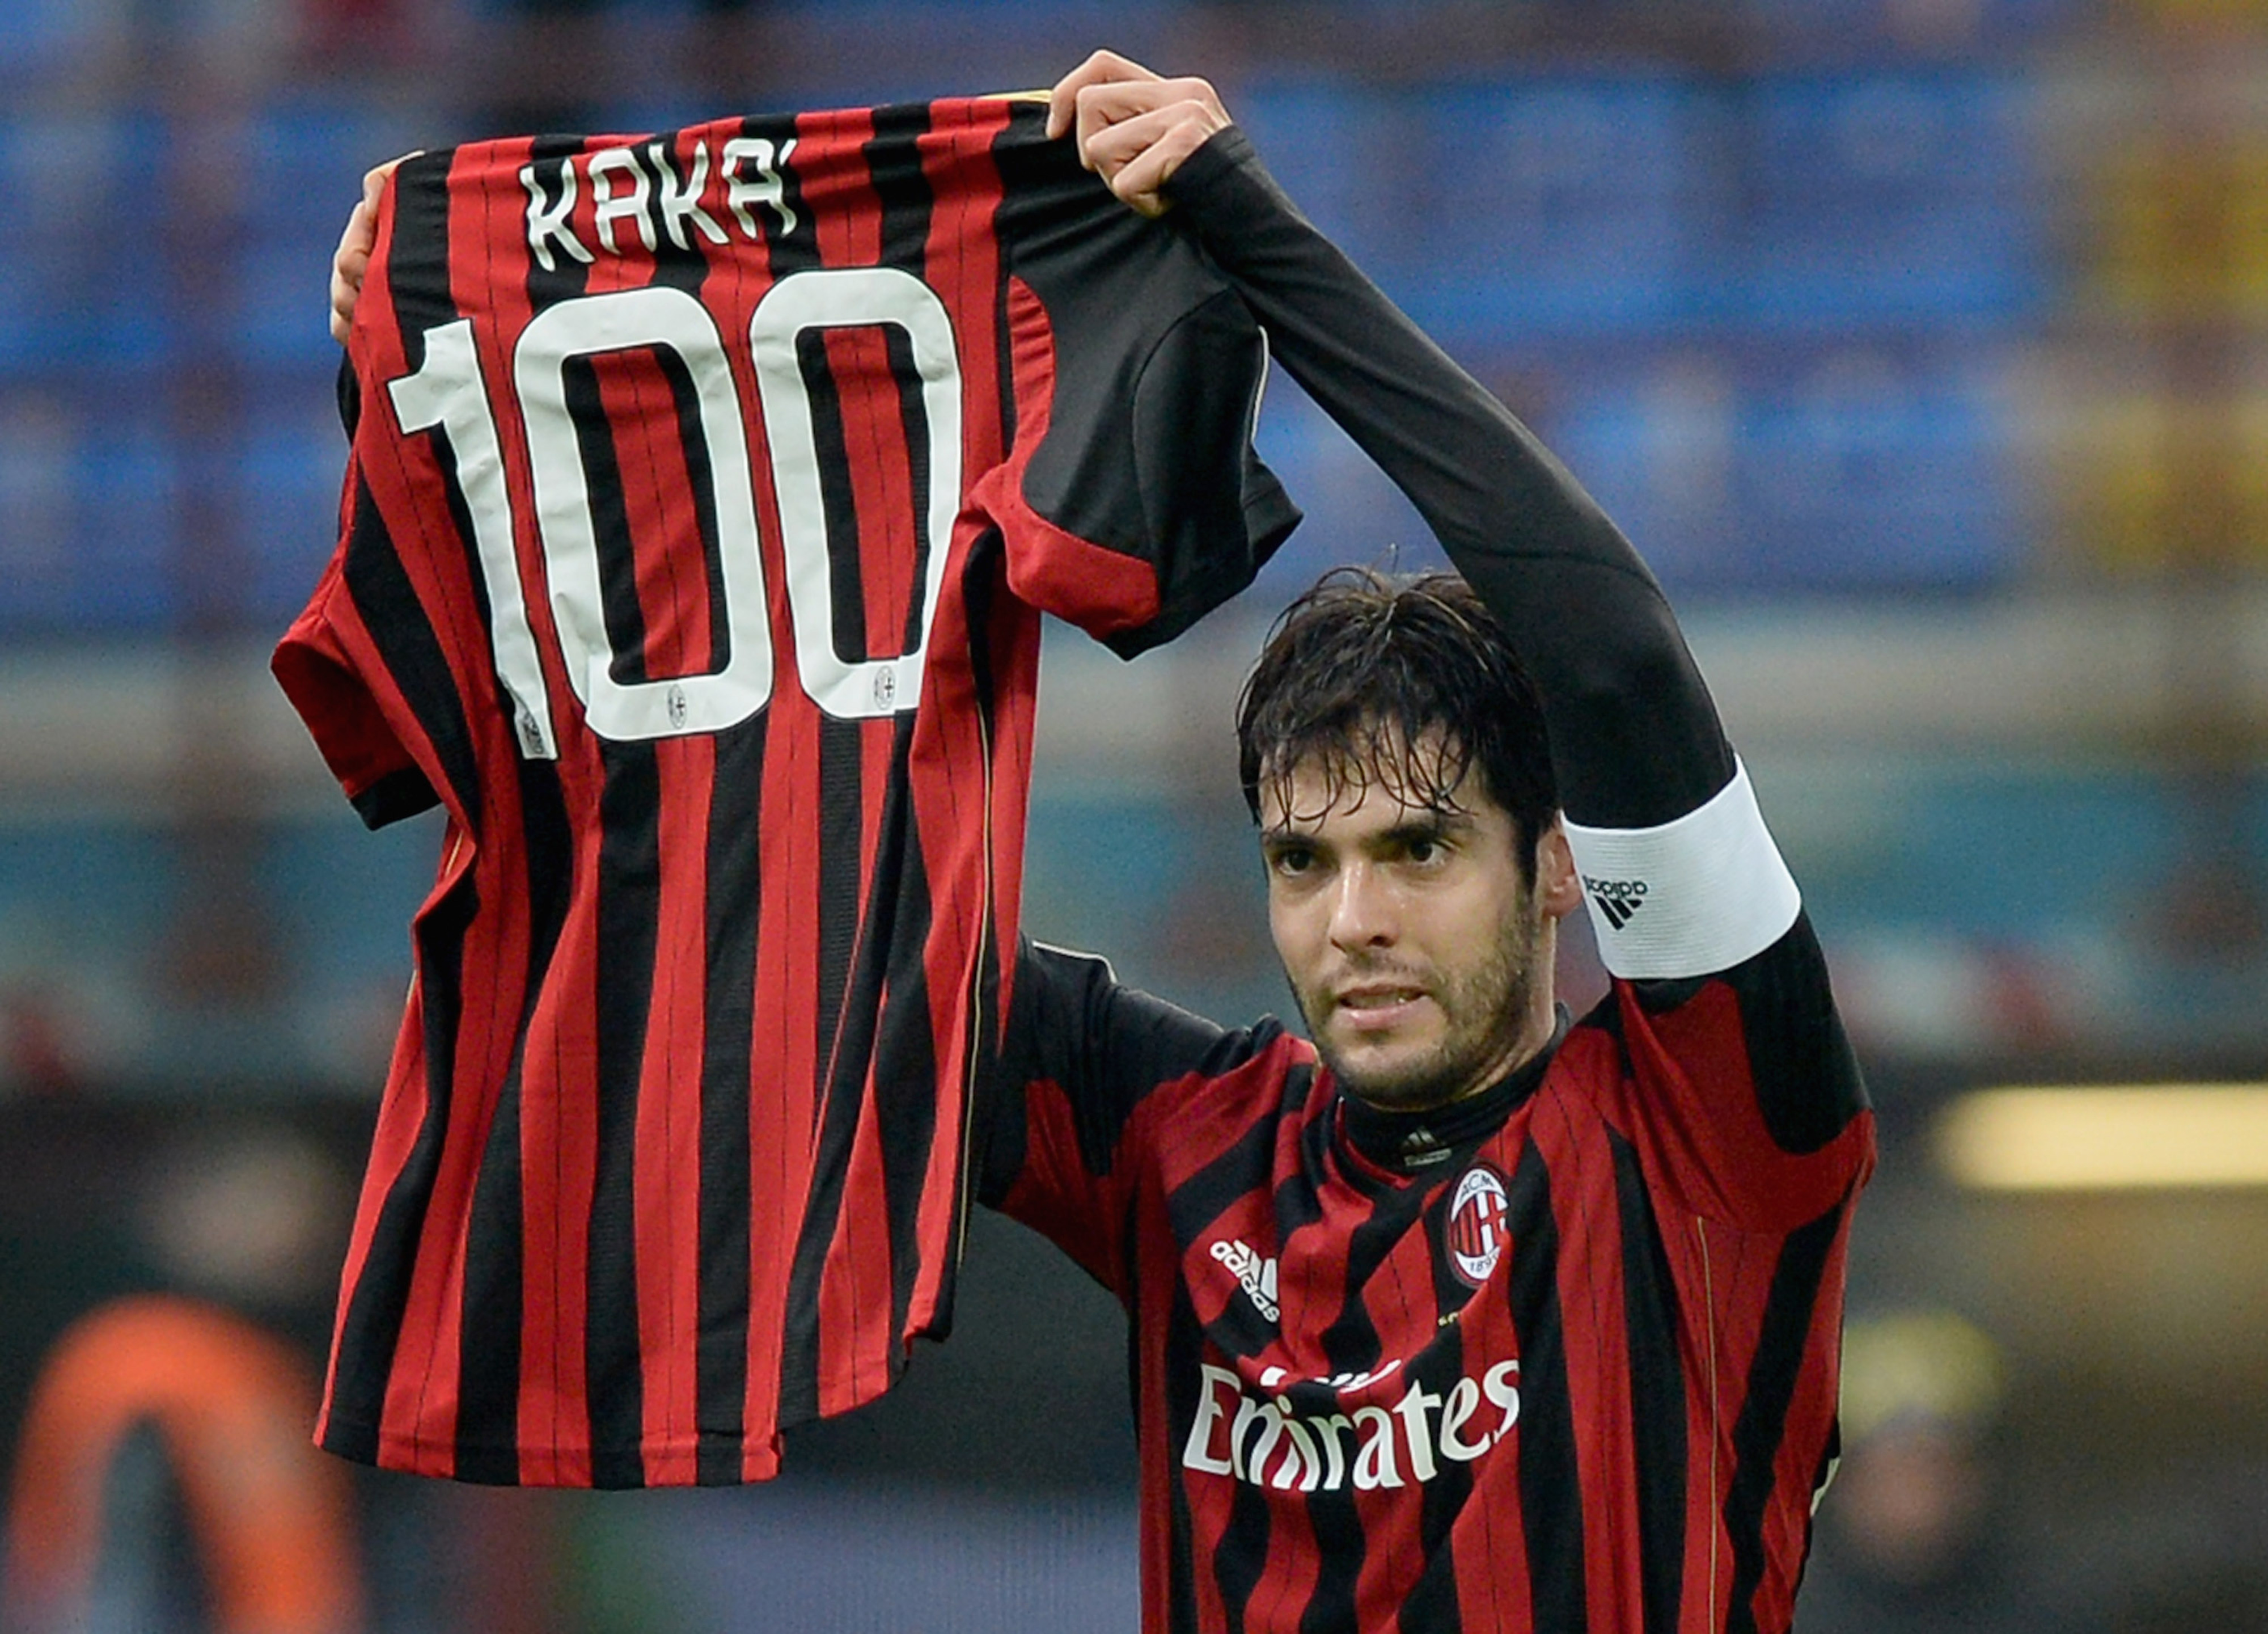 Kaka scores 100th goal for AC Milan